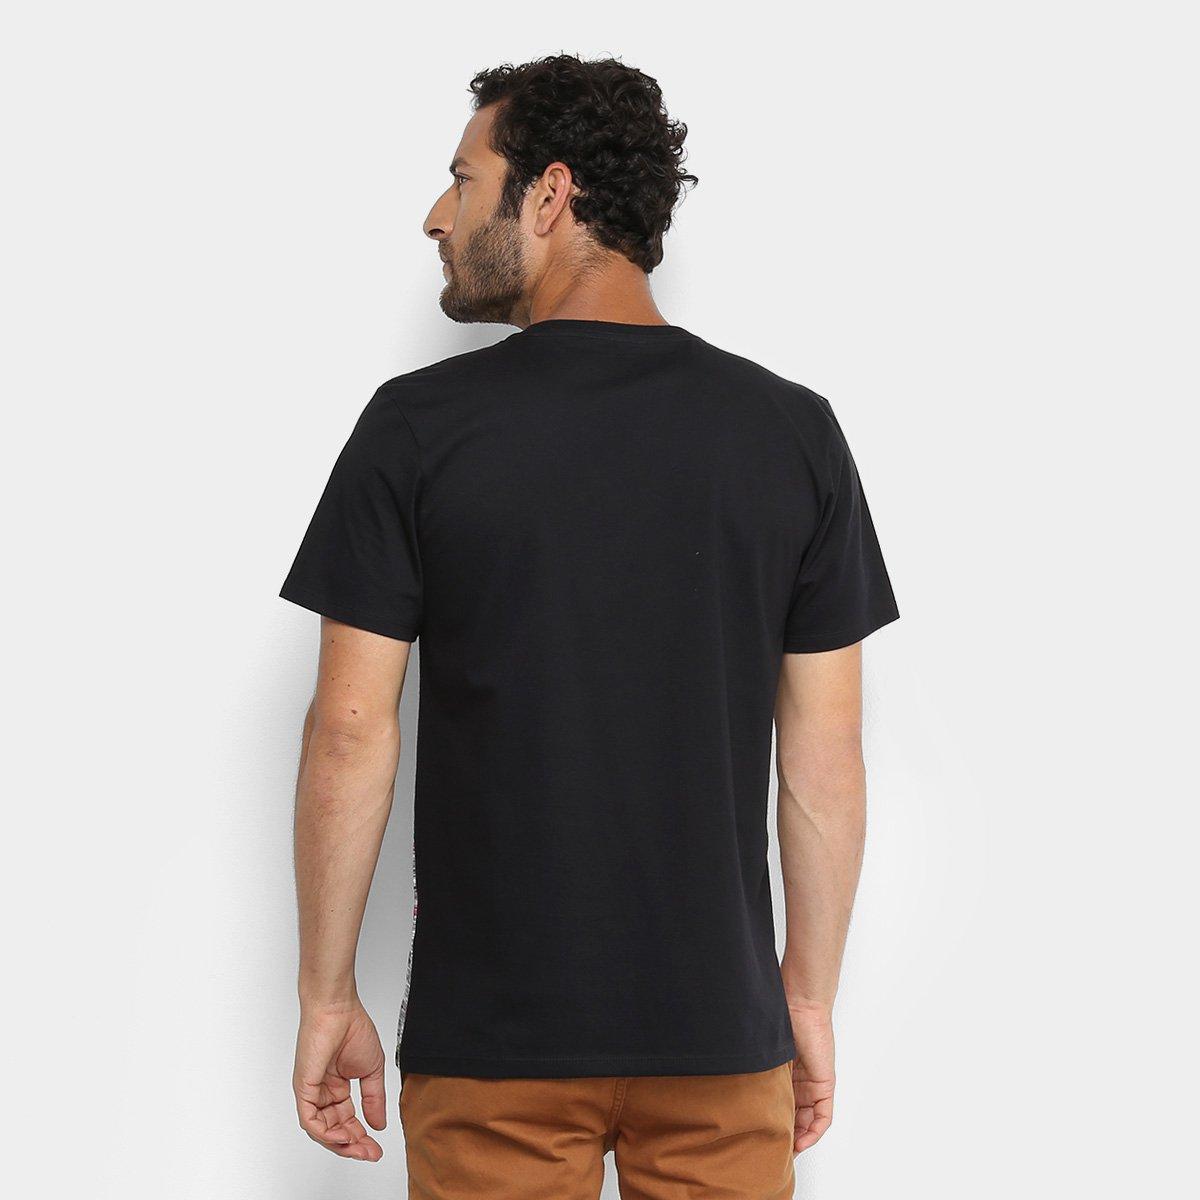 Camiseta Hurley Especial Tropic Masculina  Camiseta Hurley Especial Tropic  Masculina ... b35ef66f29885